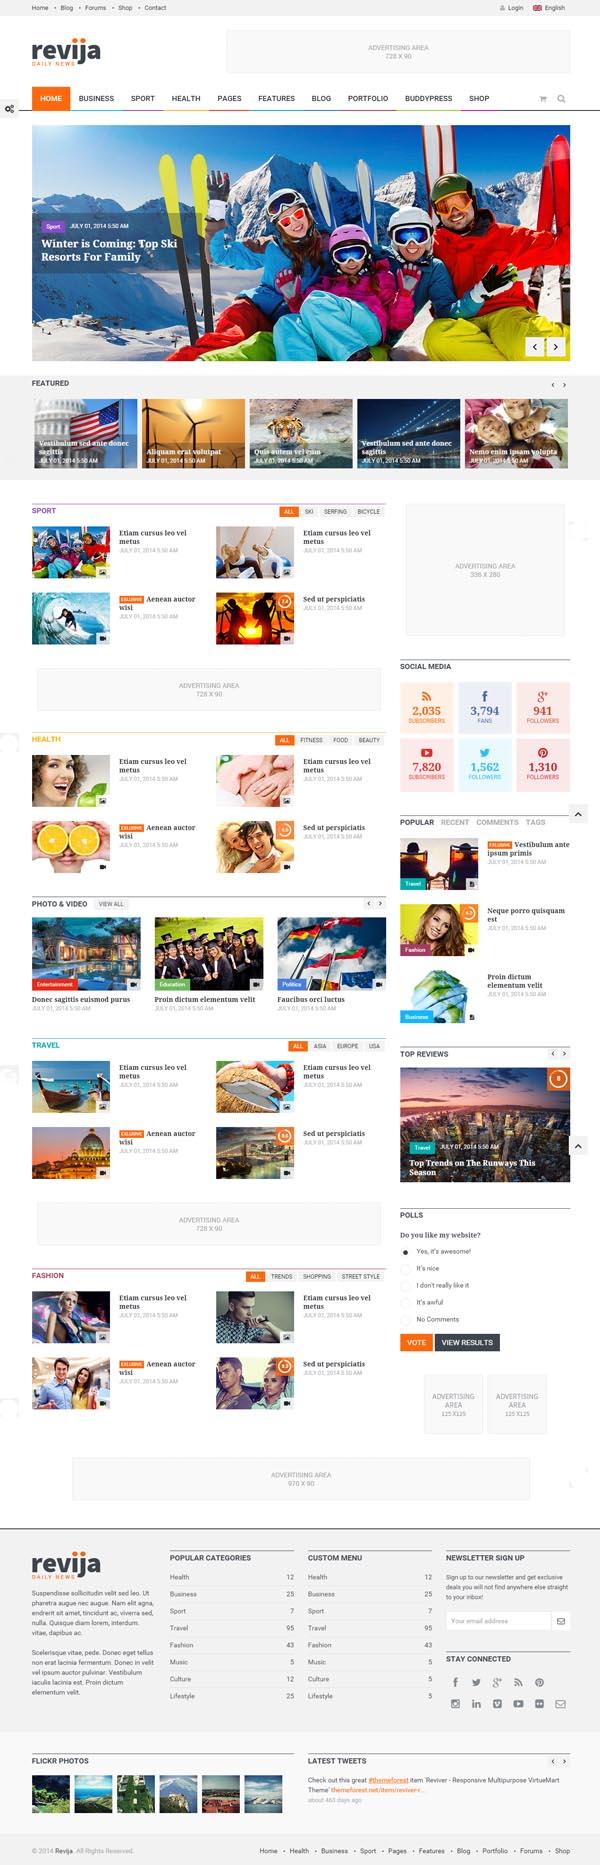 Revija - Premium Blog/Magazine HTML Template